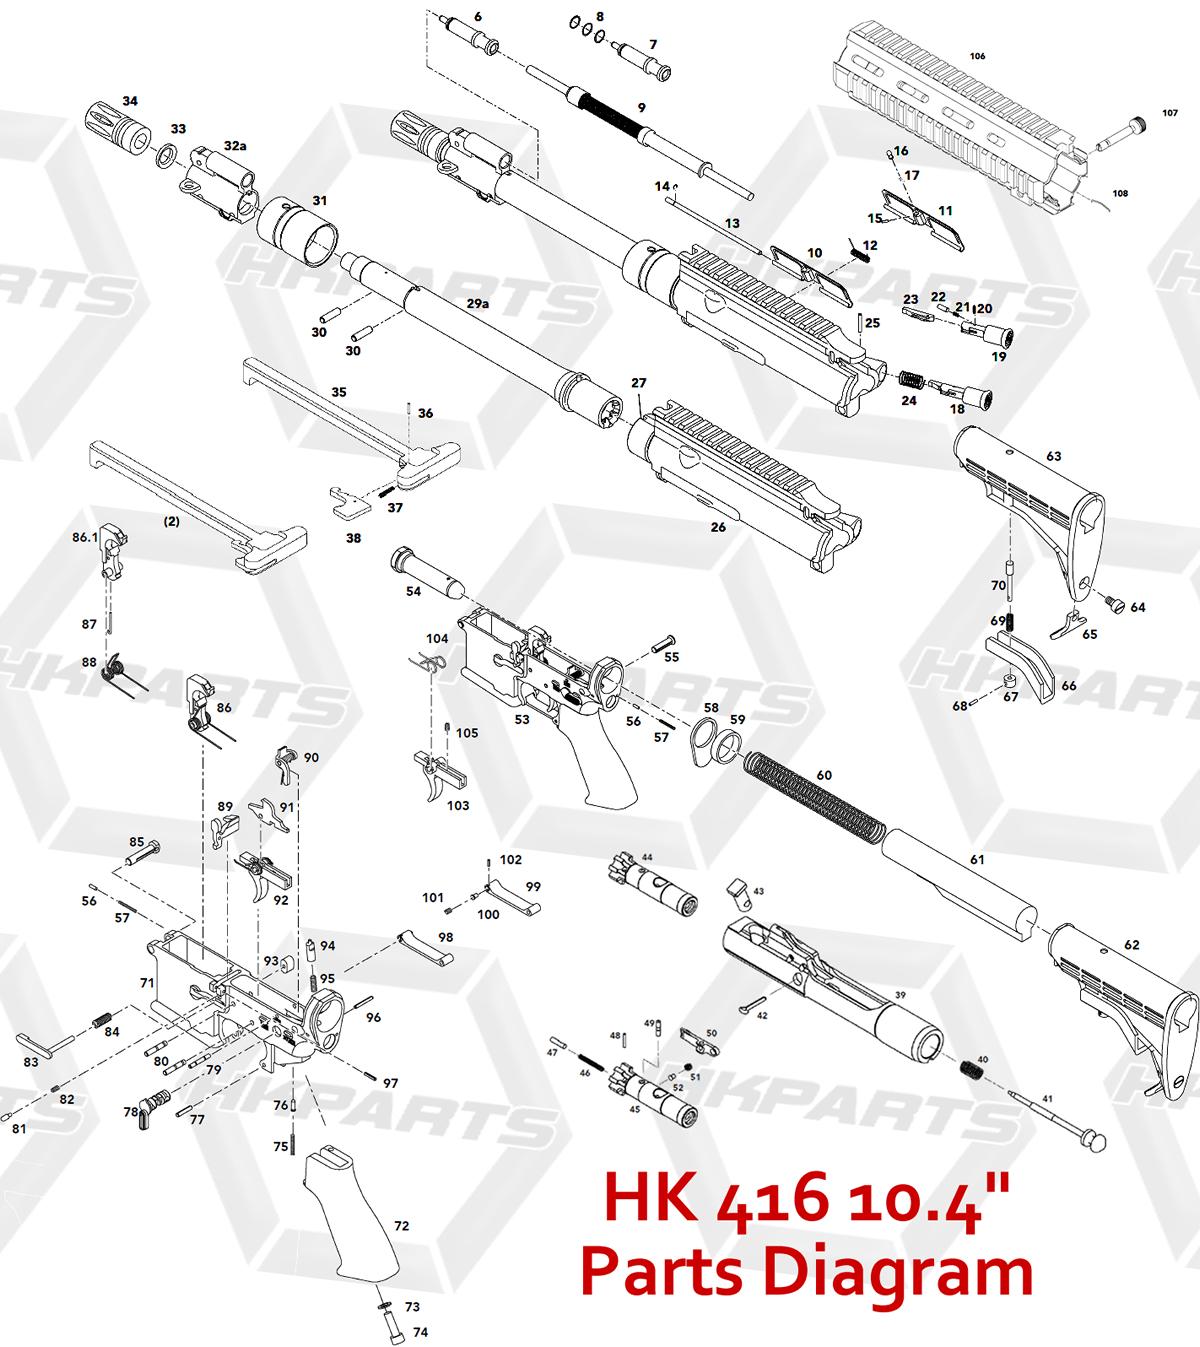 Hk416 Disassembly